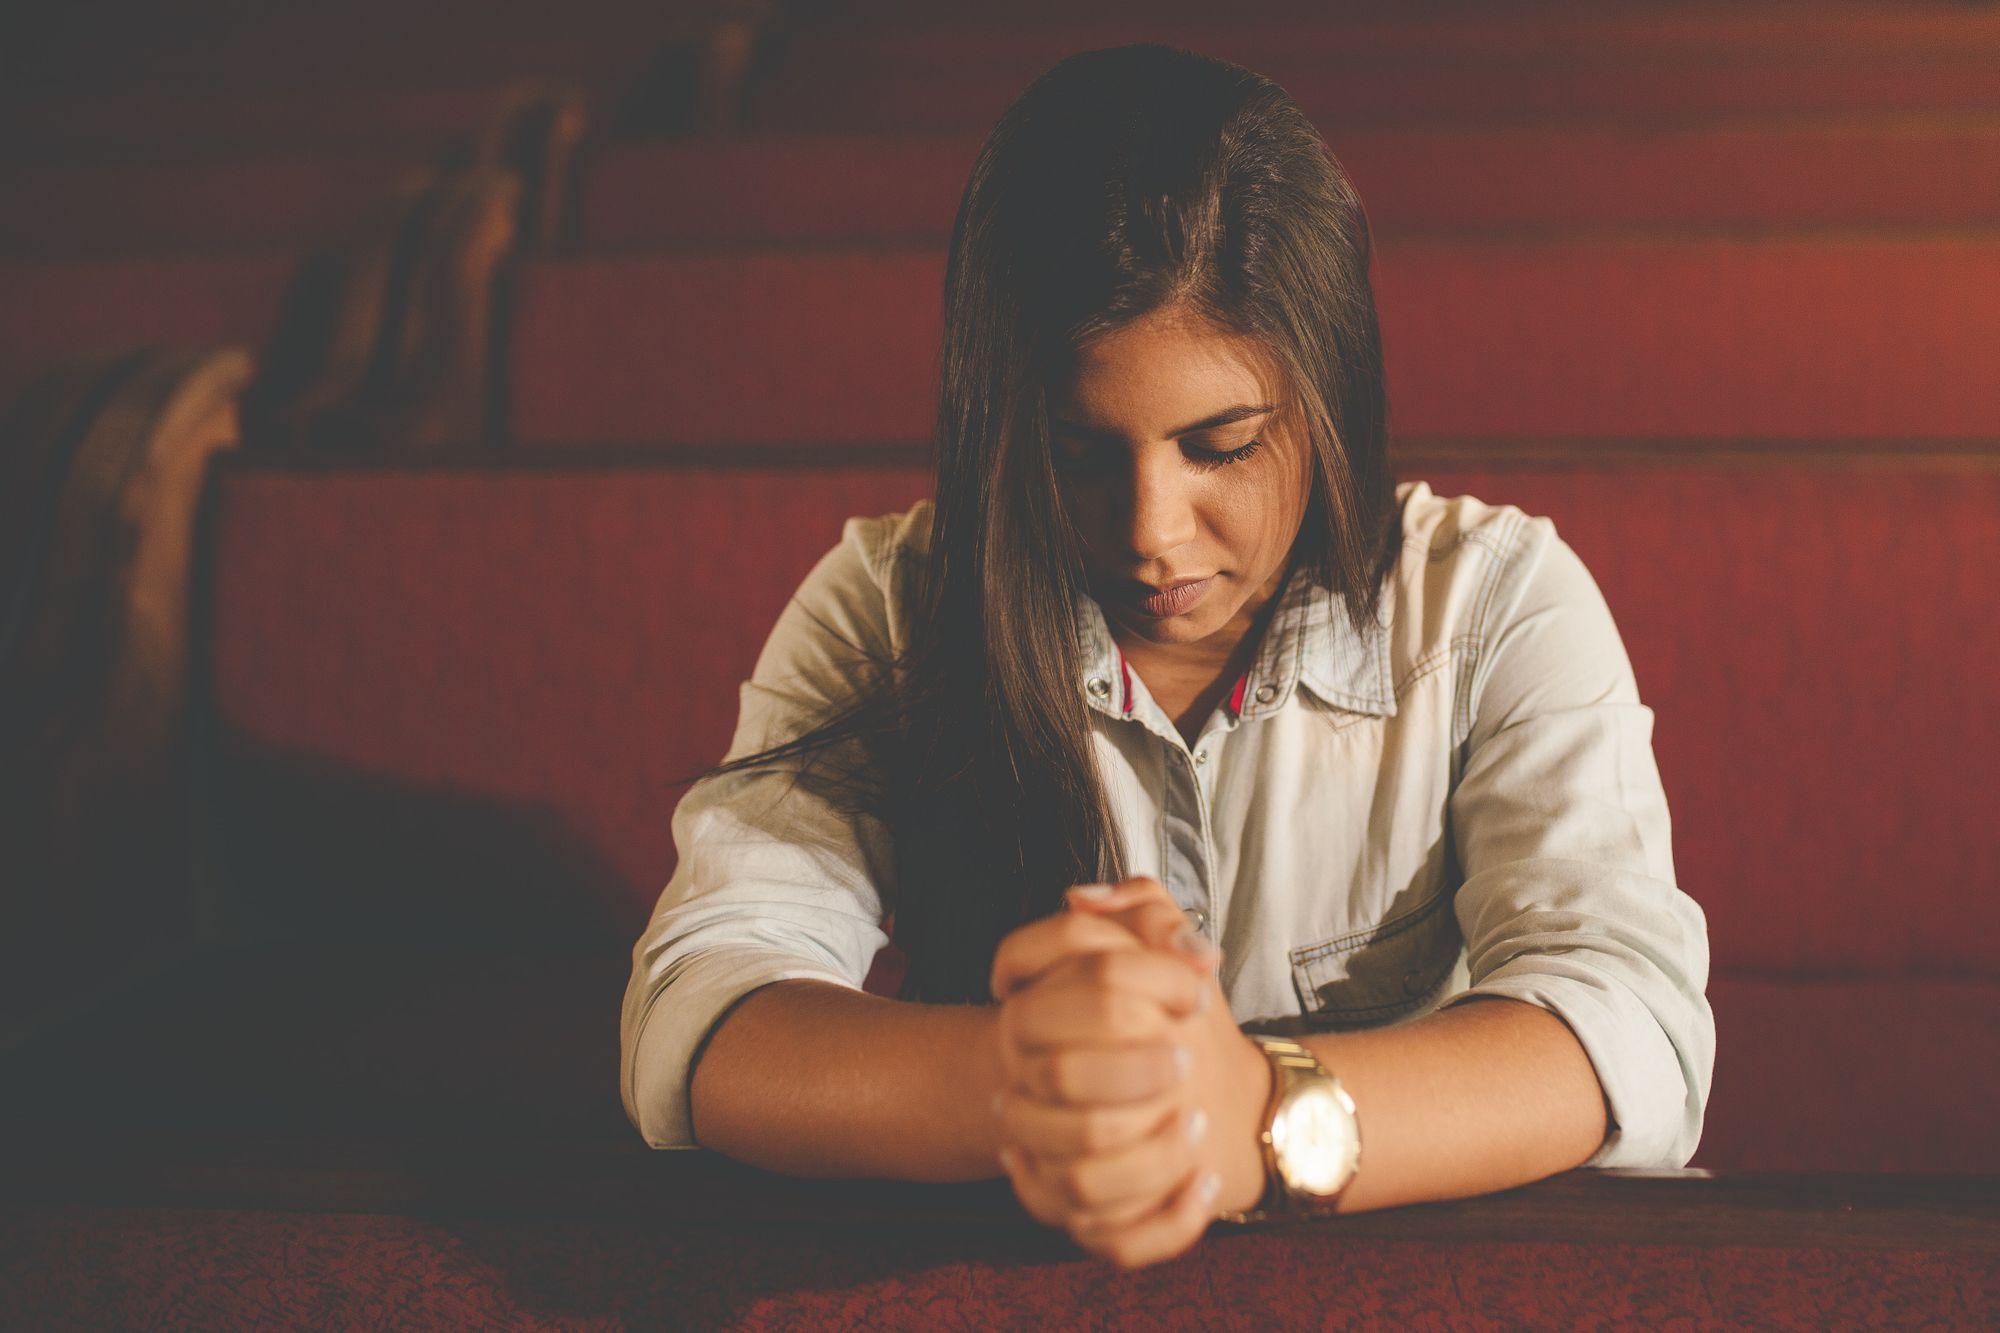 A Plea to the Silent Churches in America